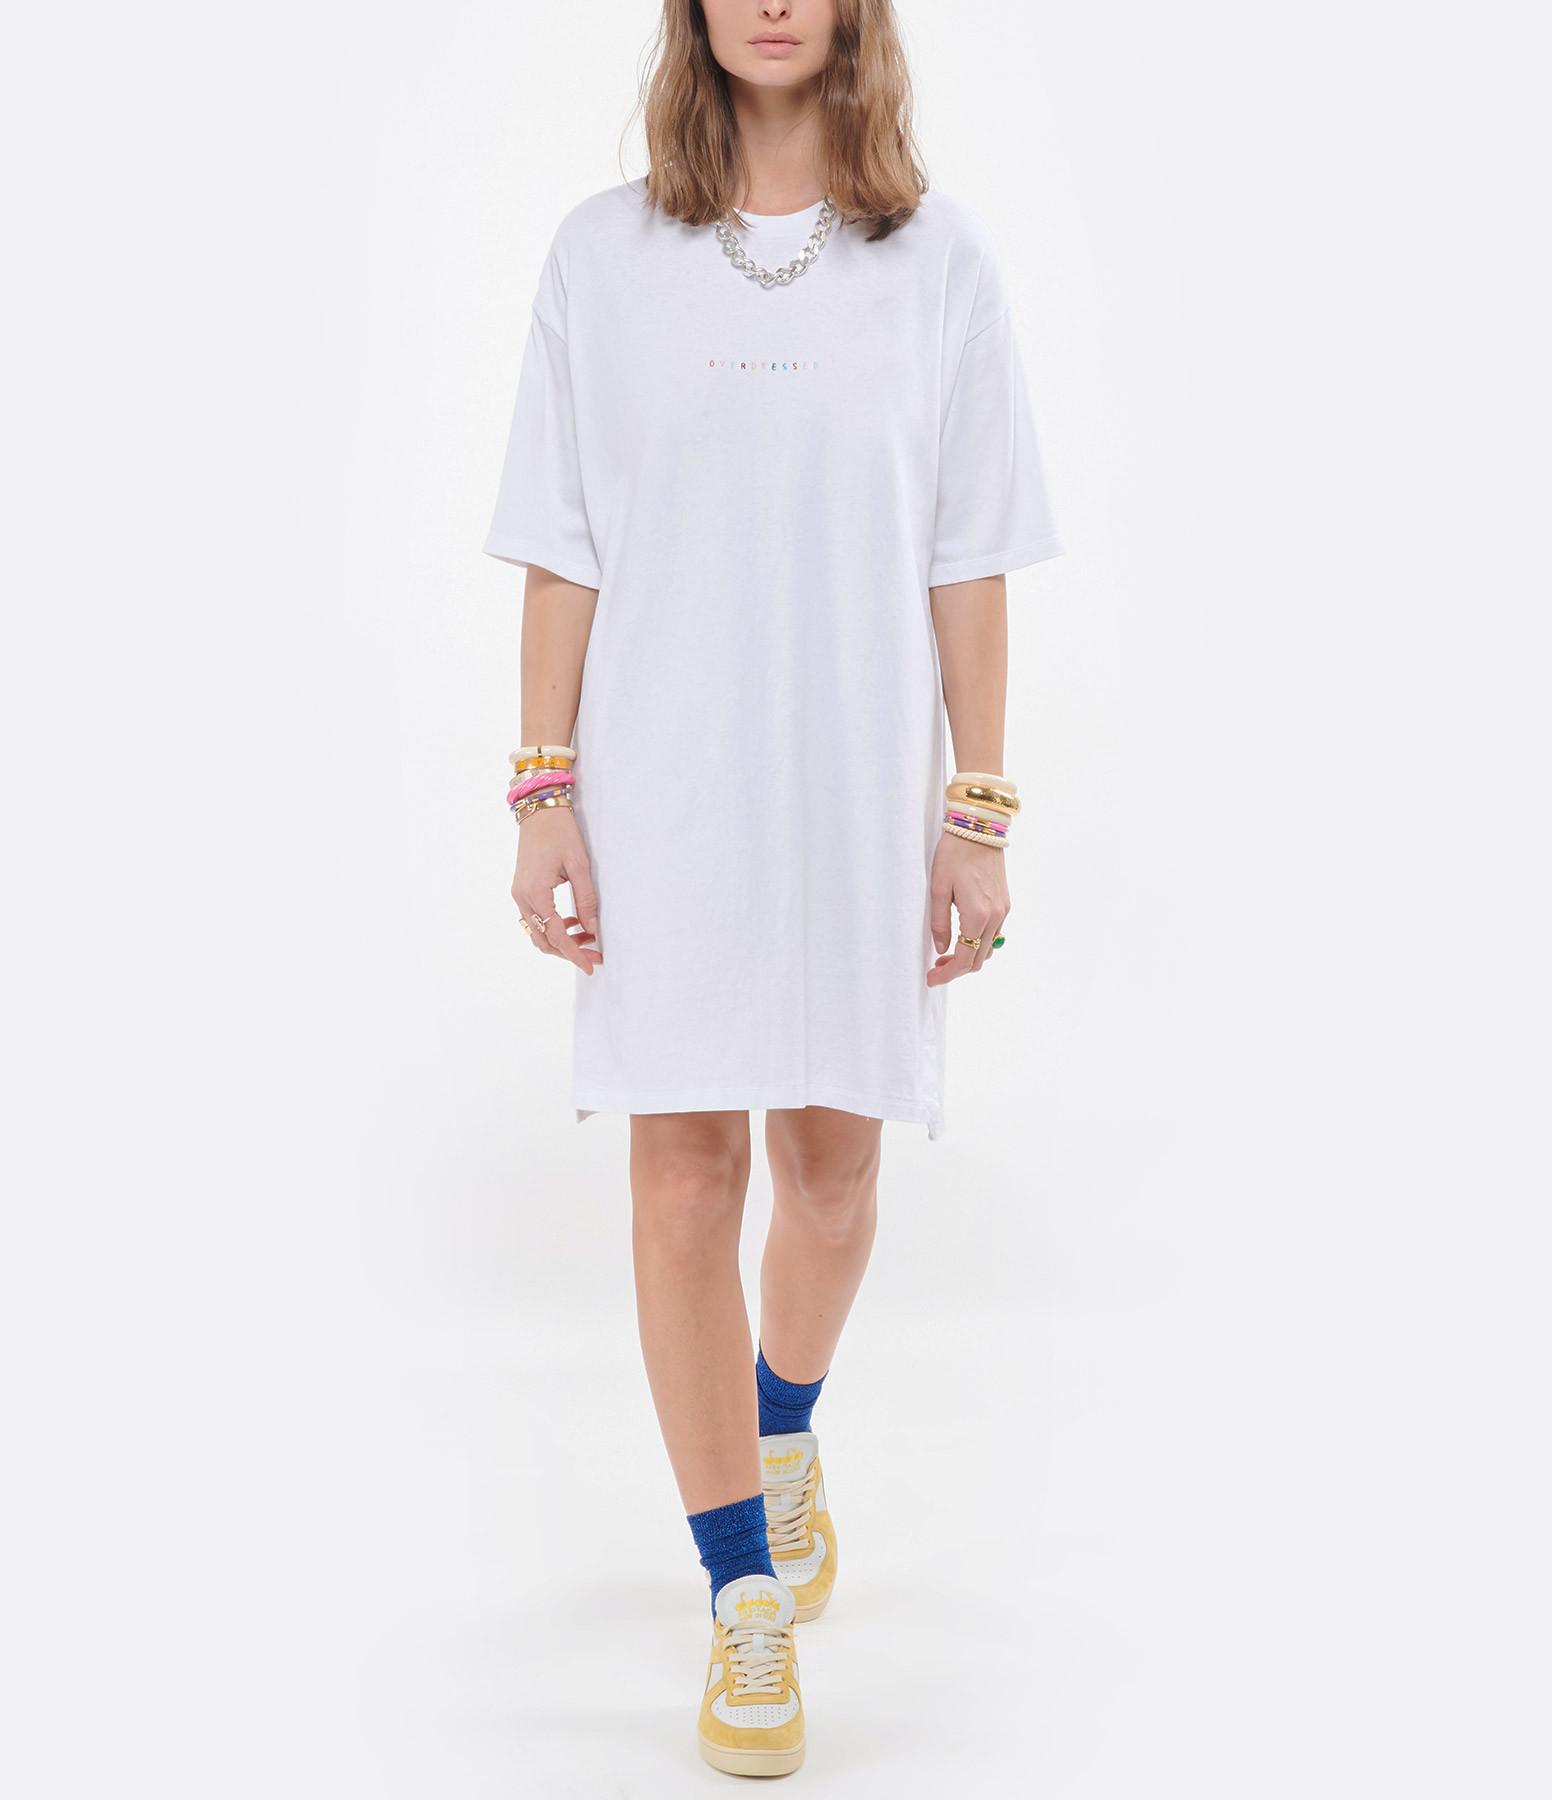 MAISON LABICHE - Robe Tee-shirt Overdressed Coton Biologique Blanc